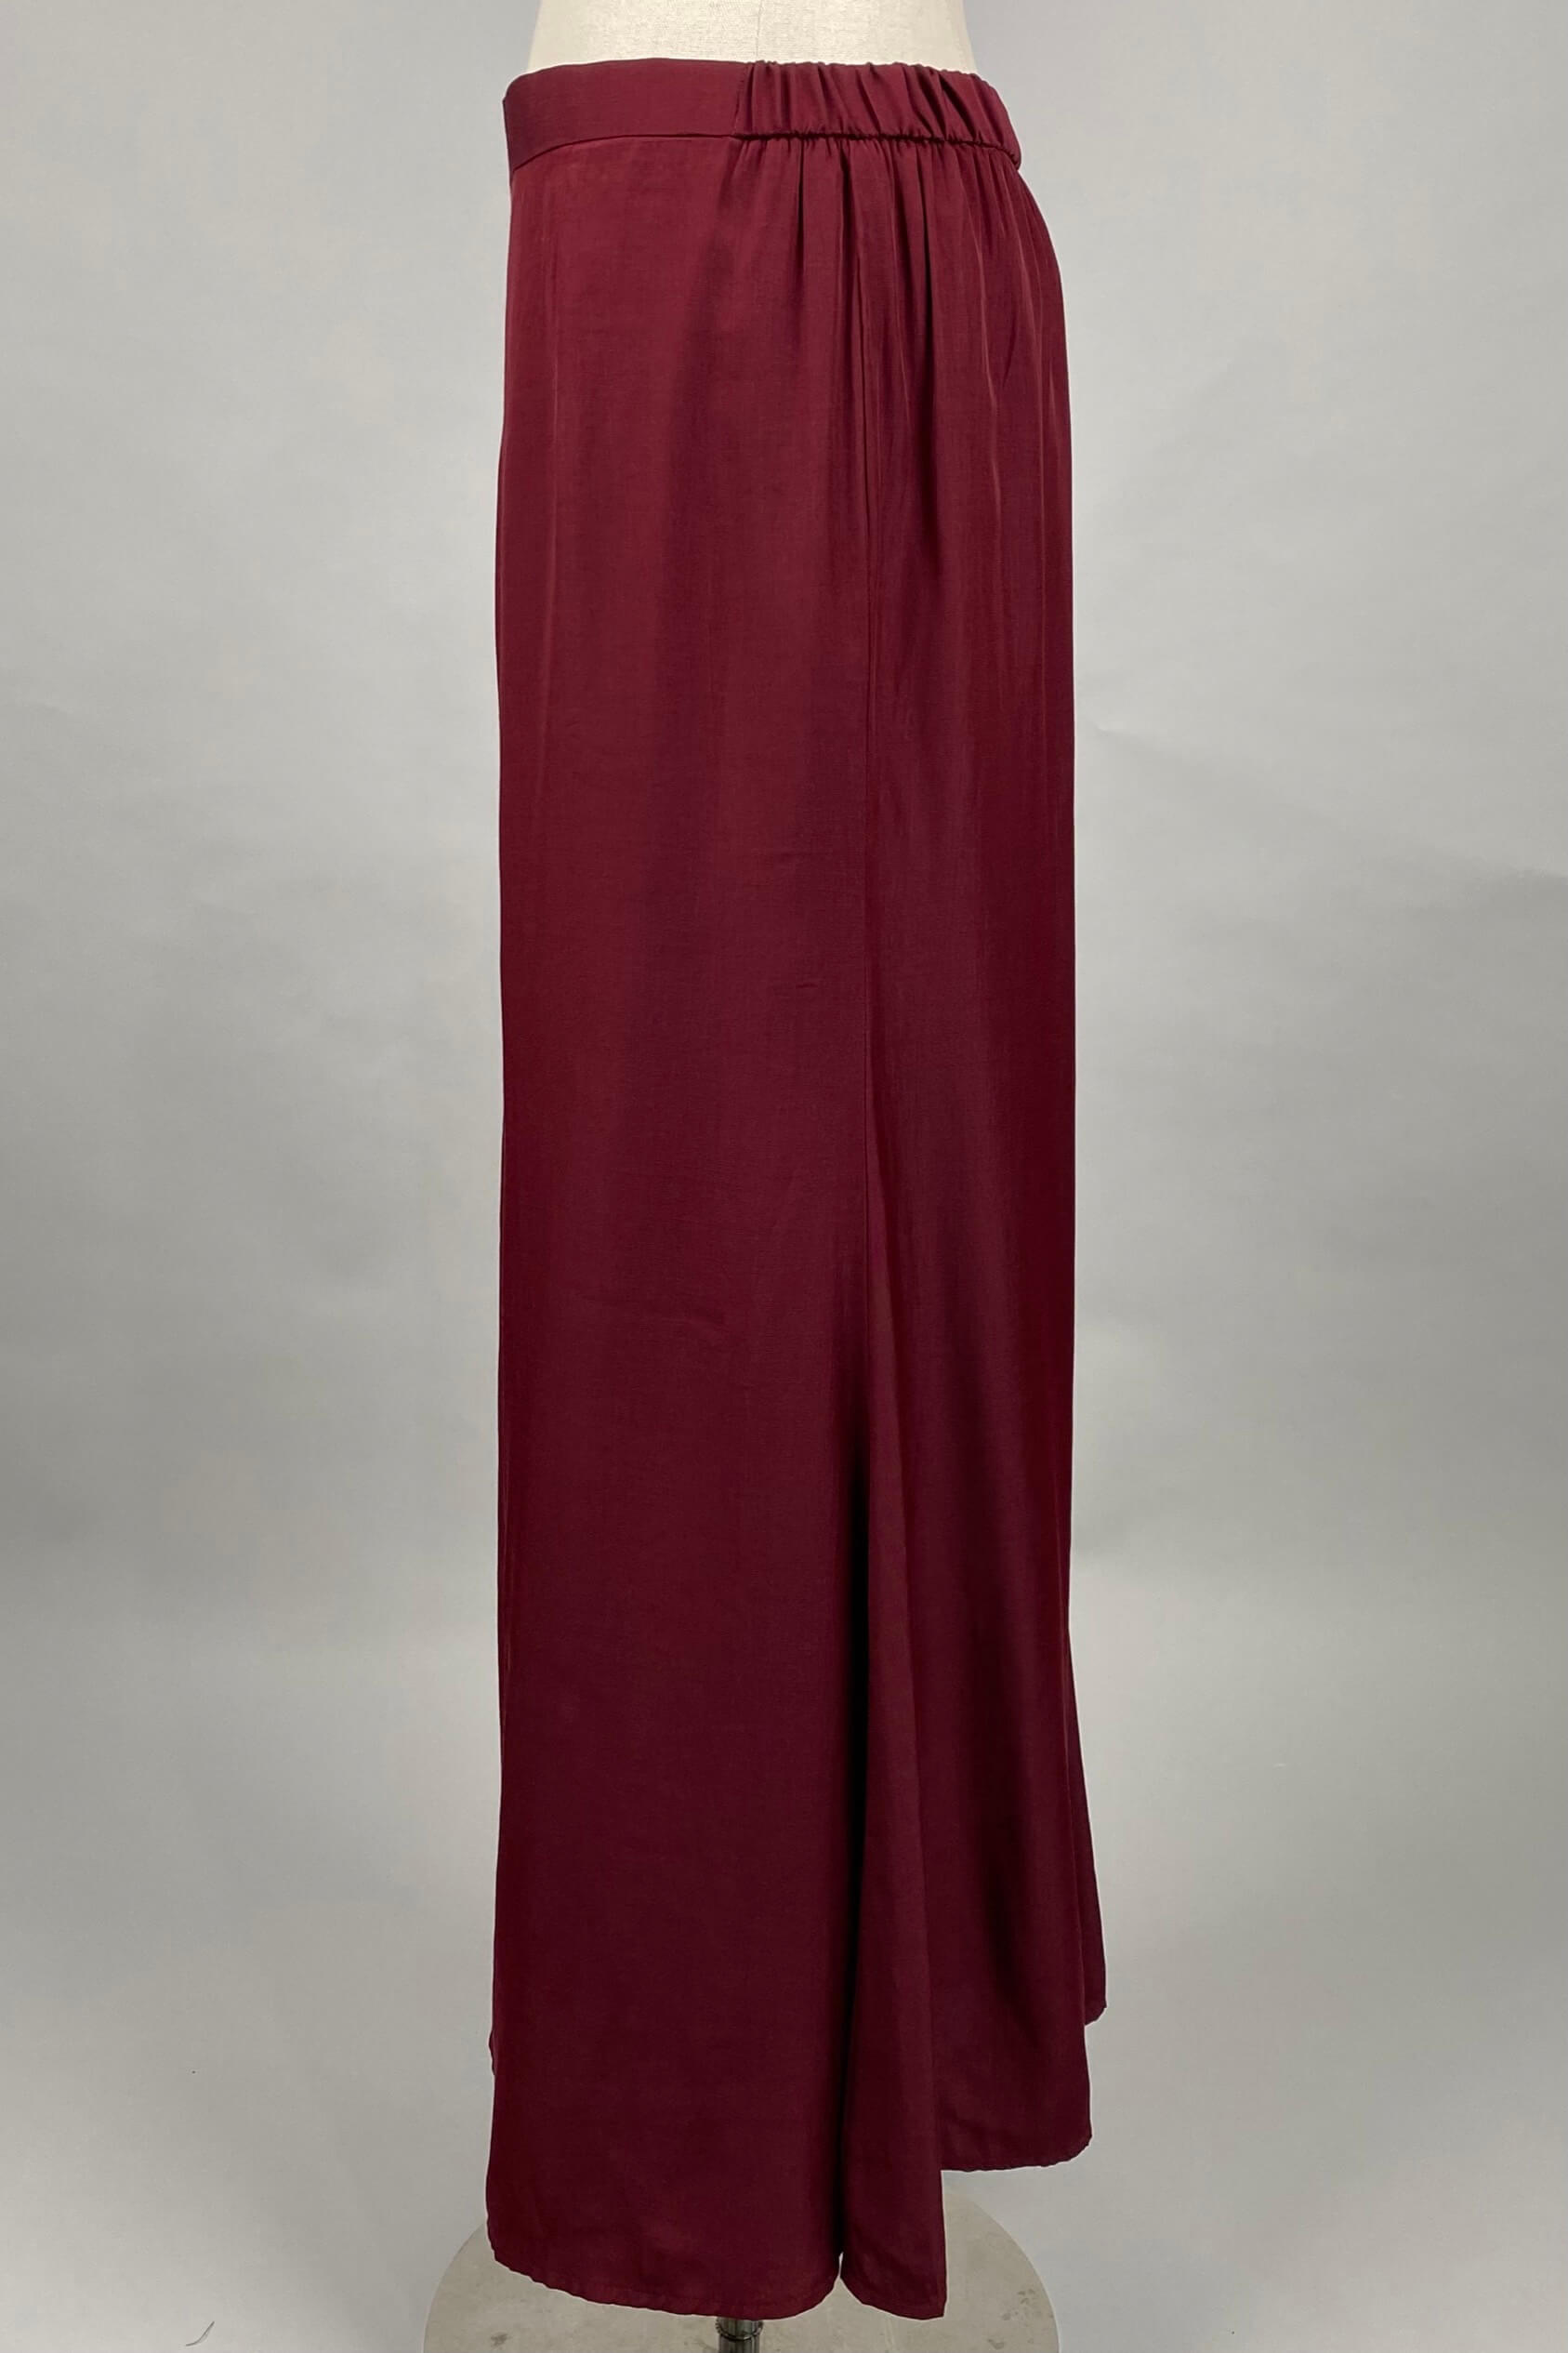 Dark Maroon Skirt 3